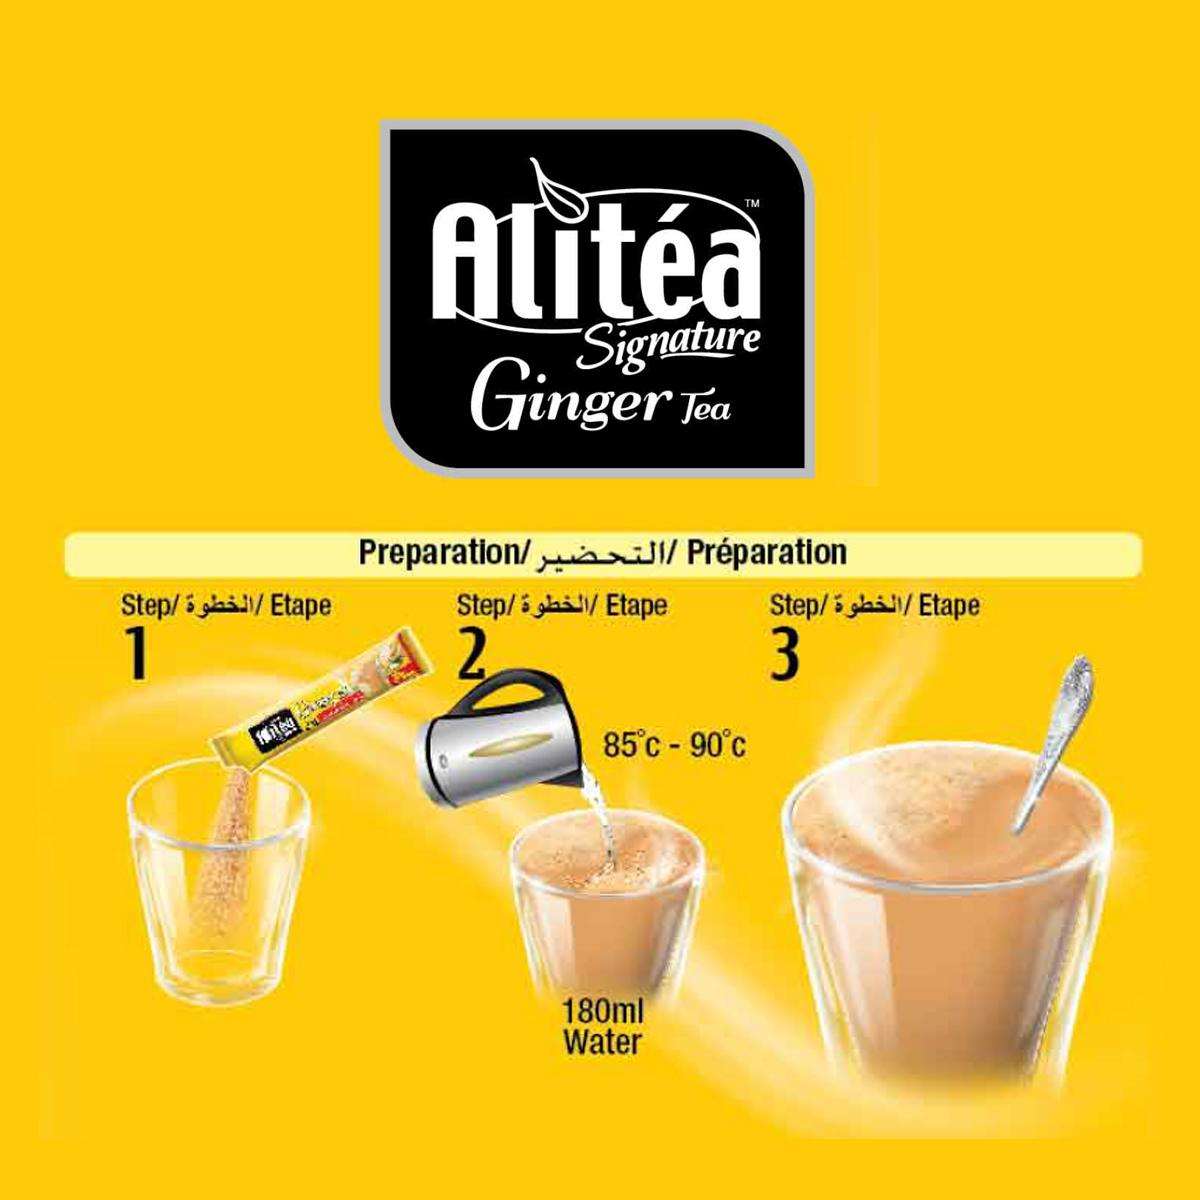 Alitéa Signature Ginger Tea